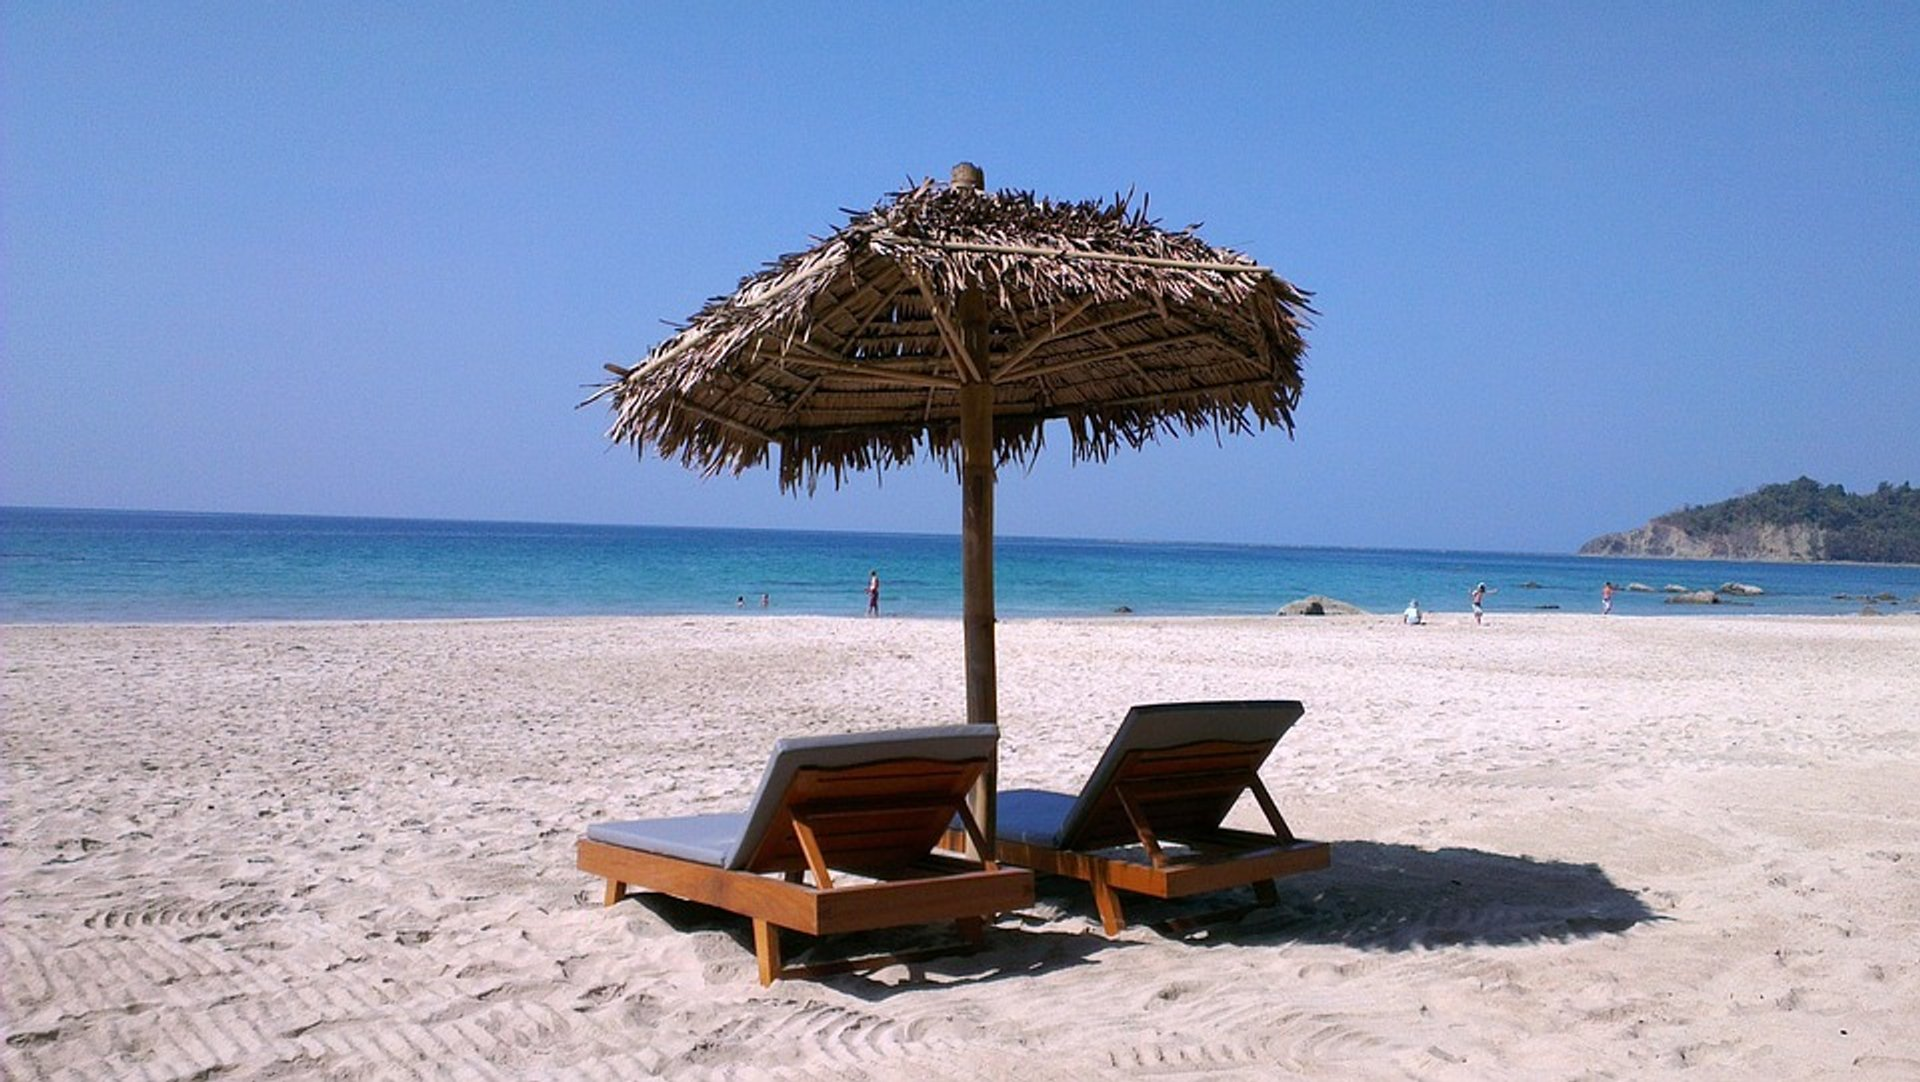 Beach Season in Myanmar 2020 - Best Time